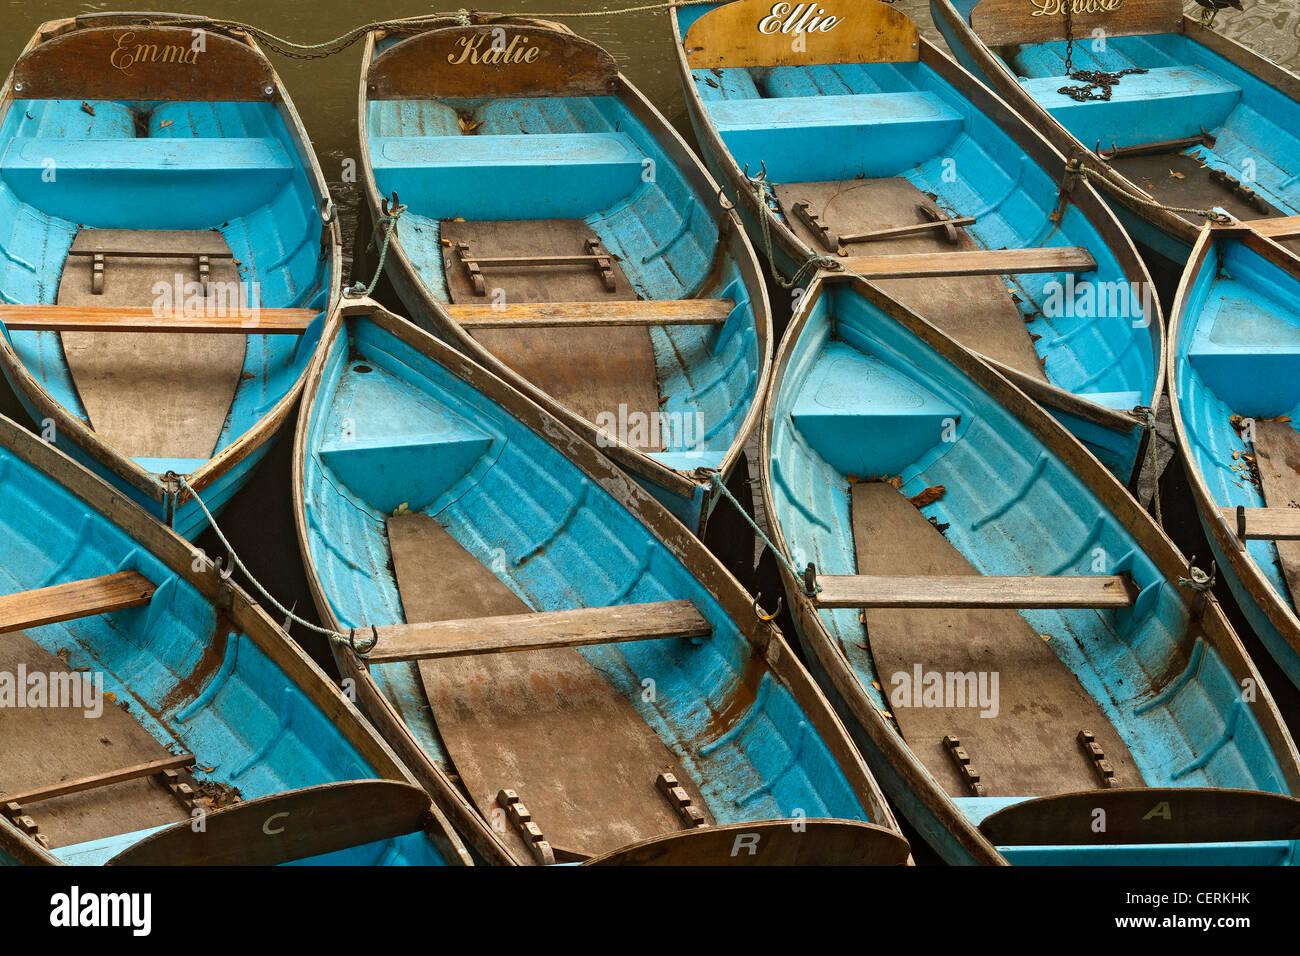 UK Oxford Rowing Boats - Stock Image